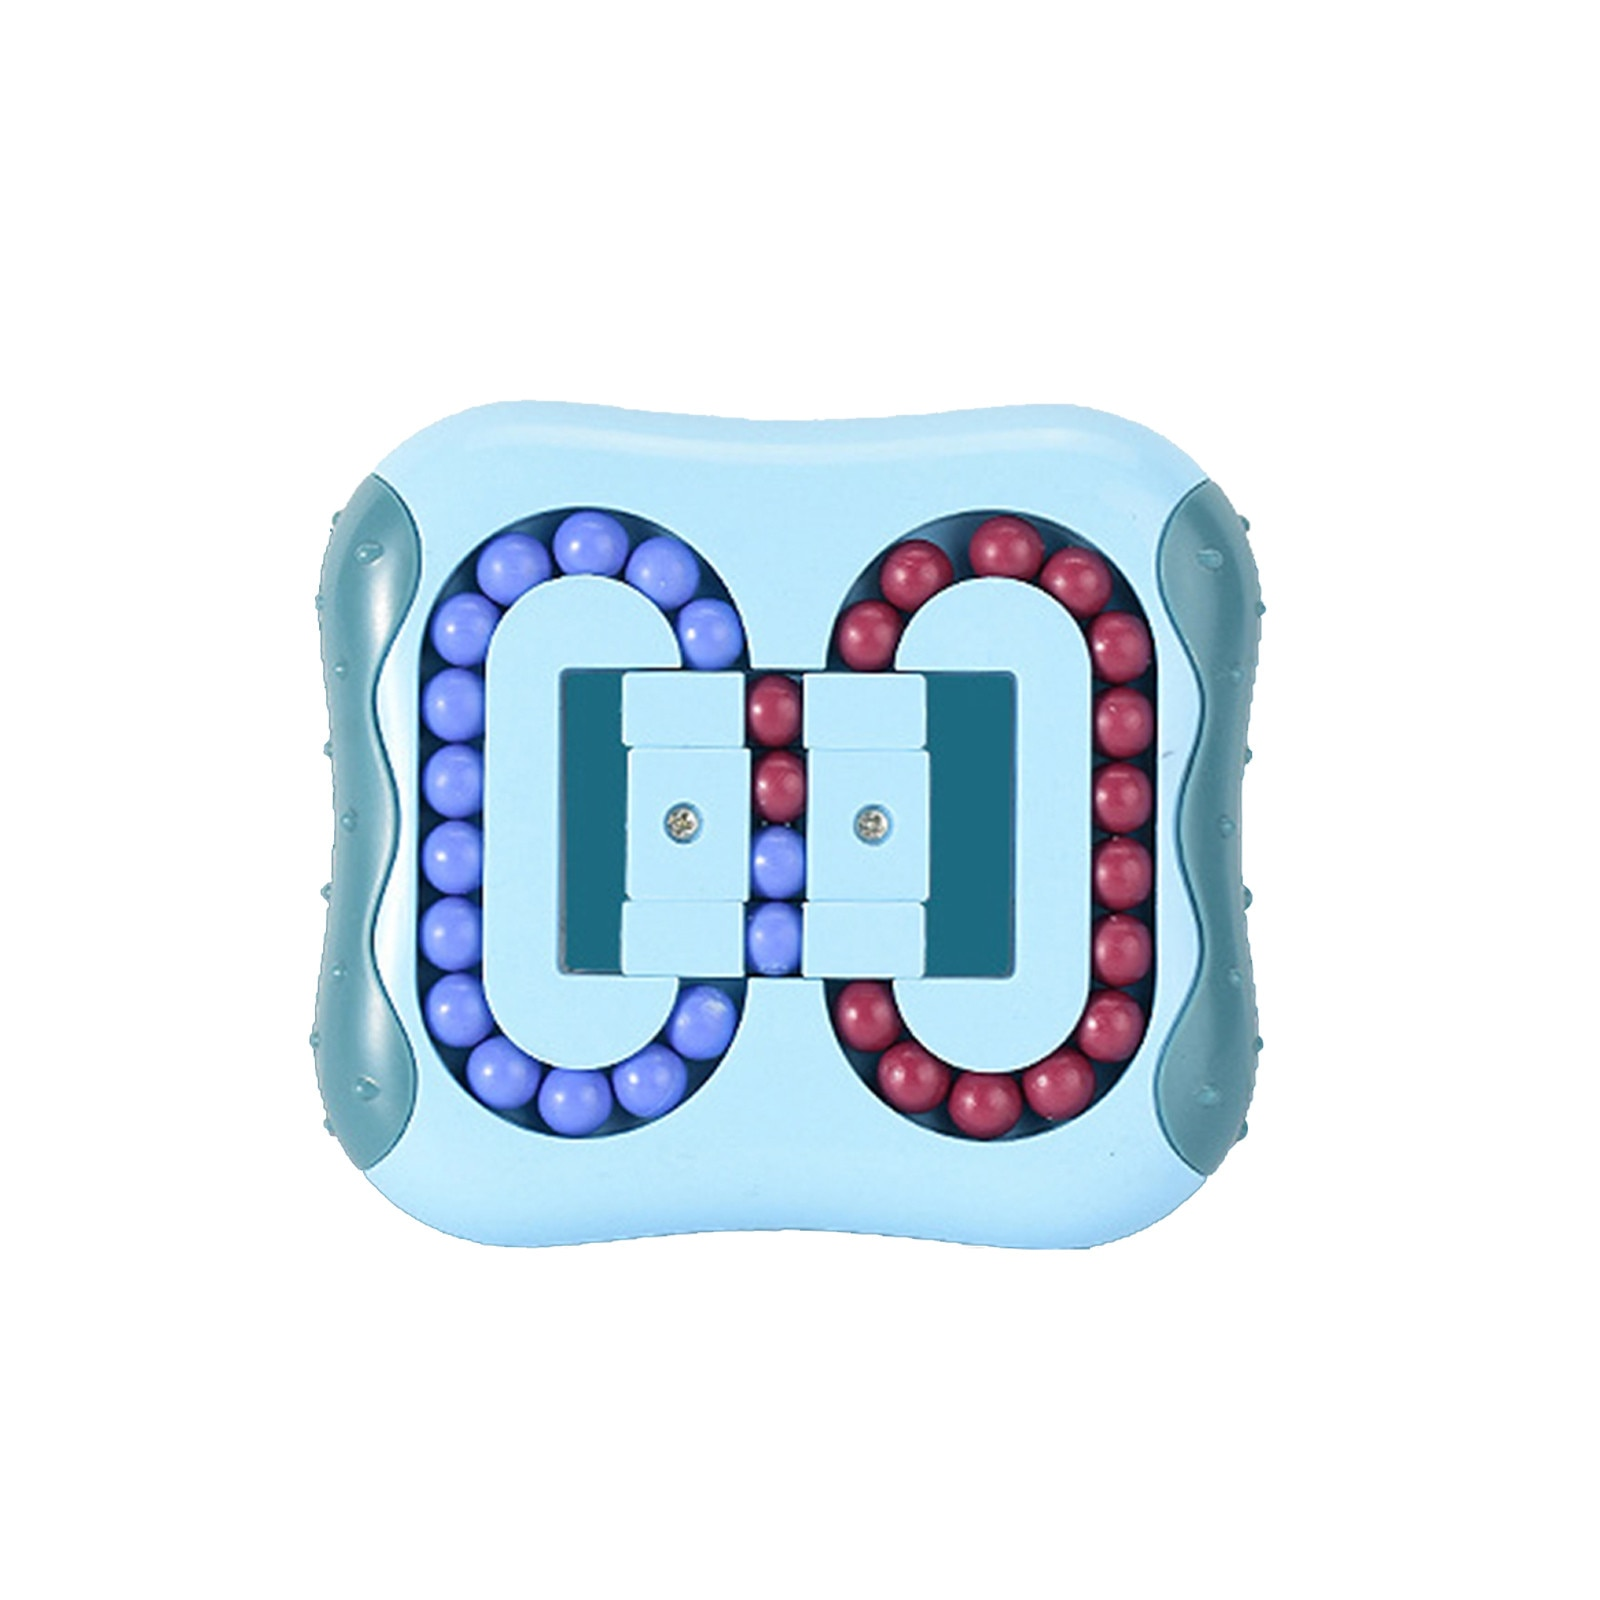 Rotating Magic Bean Intelligence Fingertip Cube Children Finger Gyro Magic Disk Educational Cube Toys enlarge